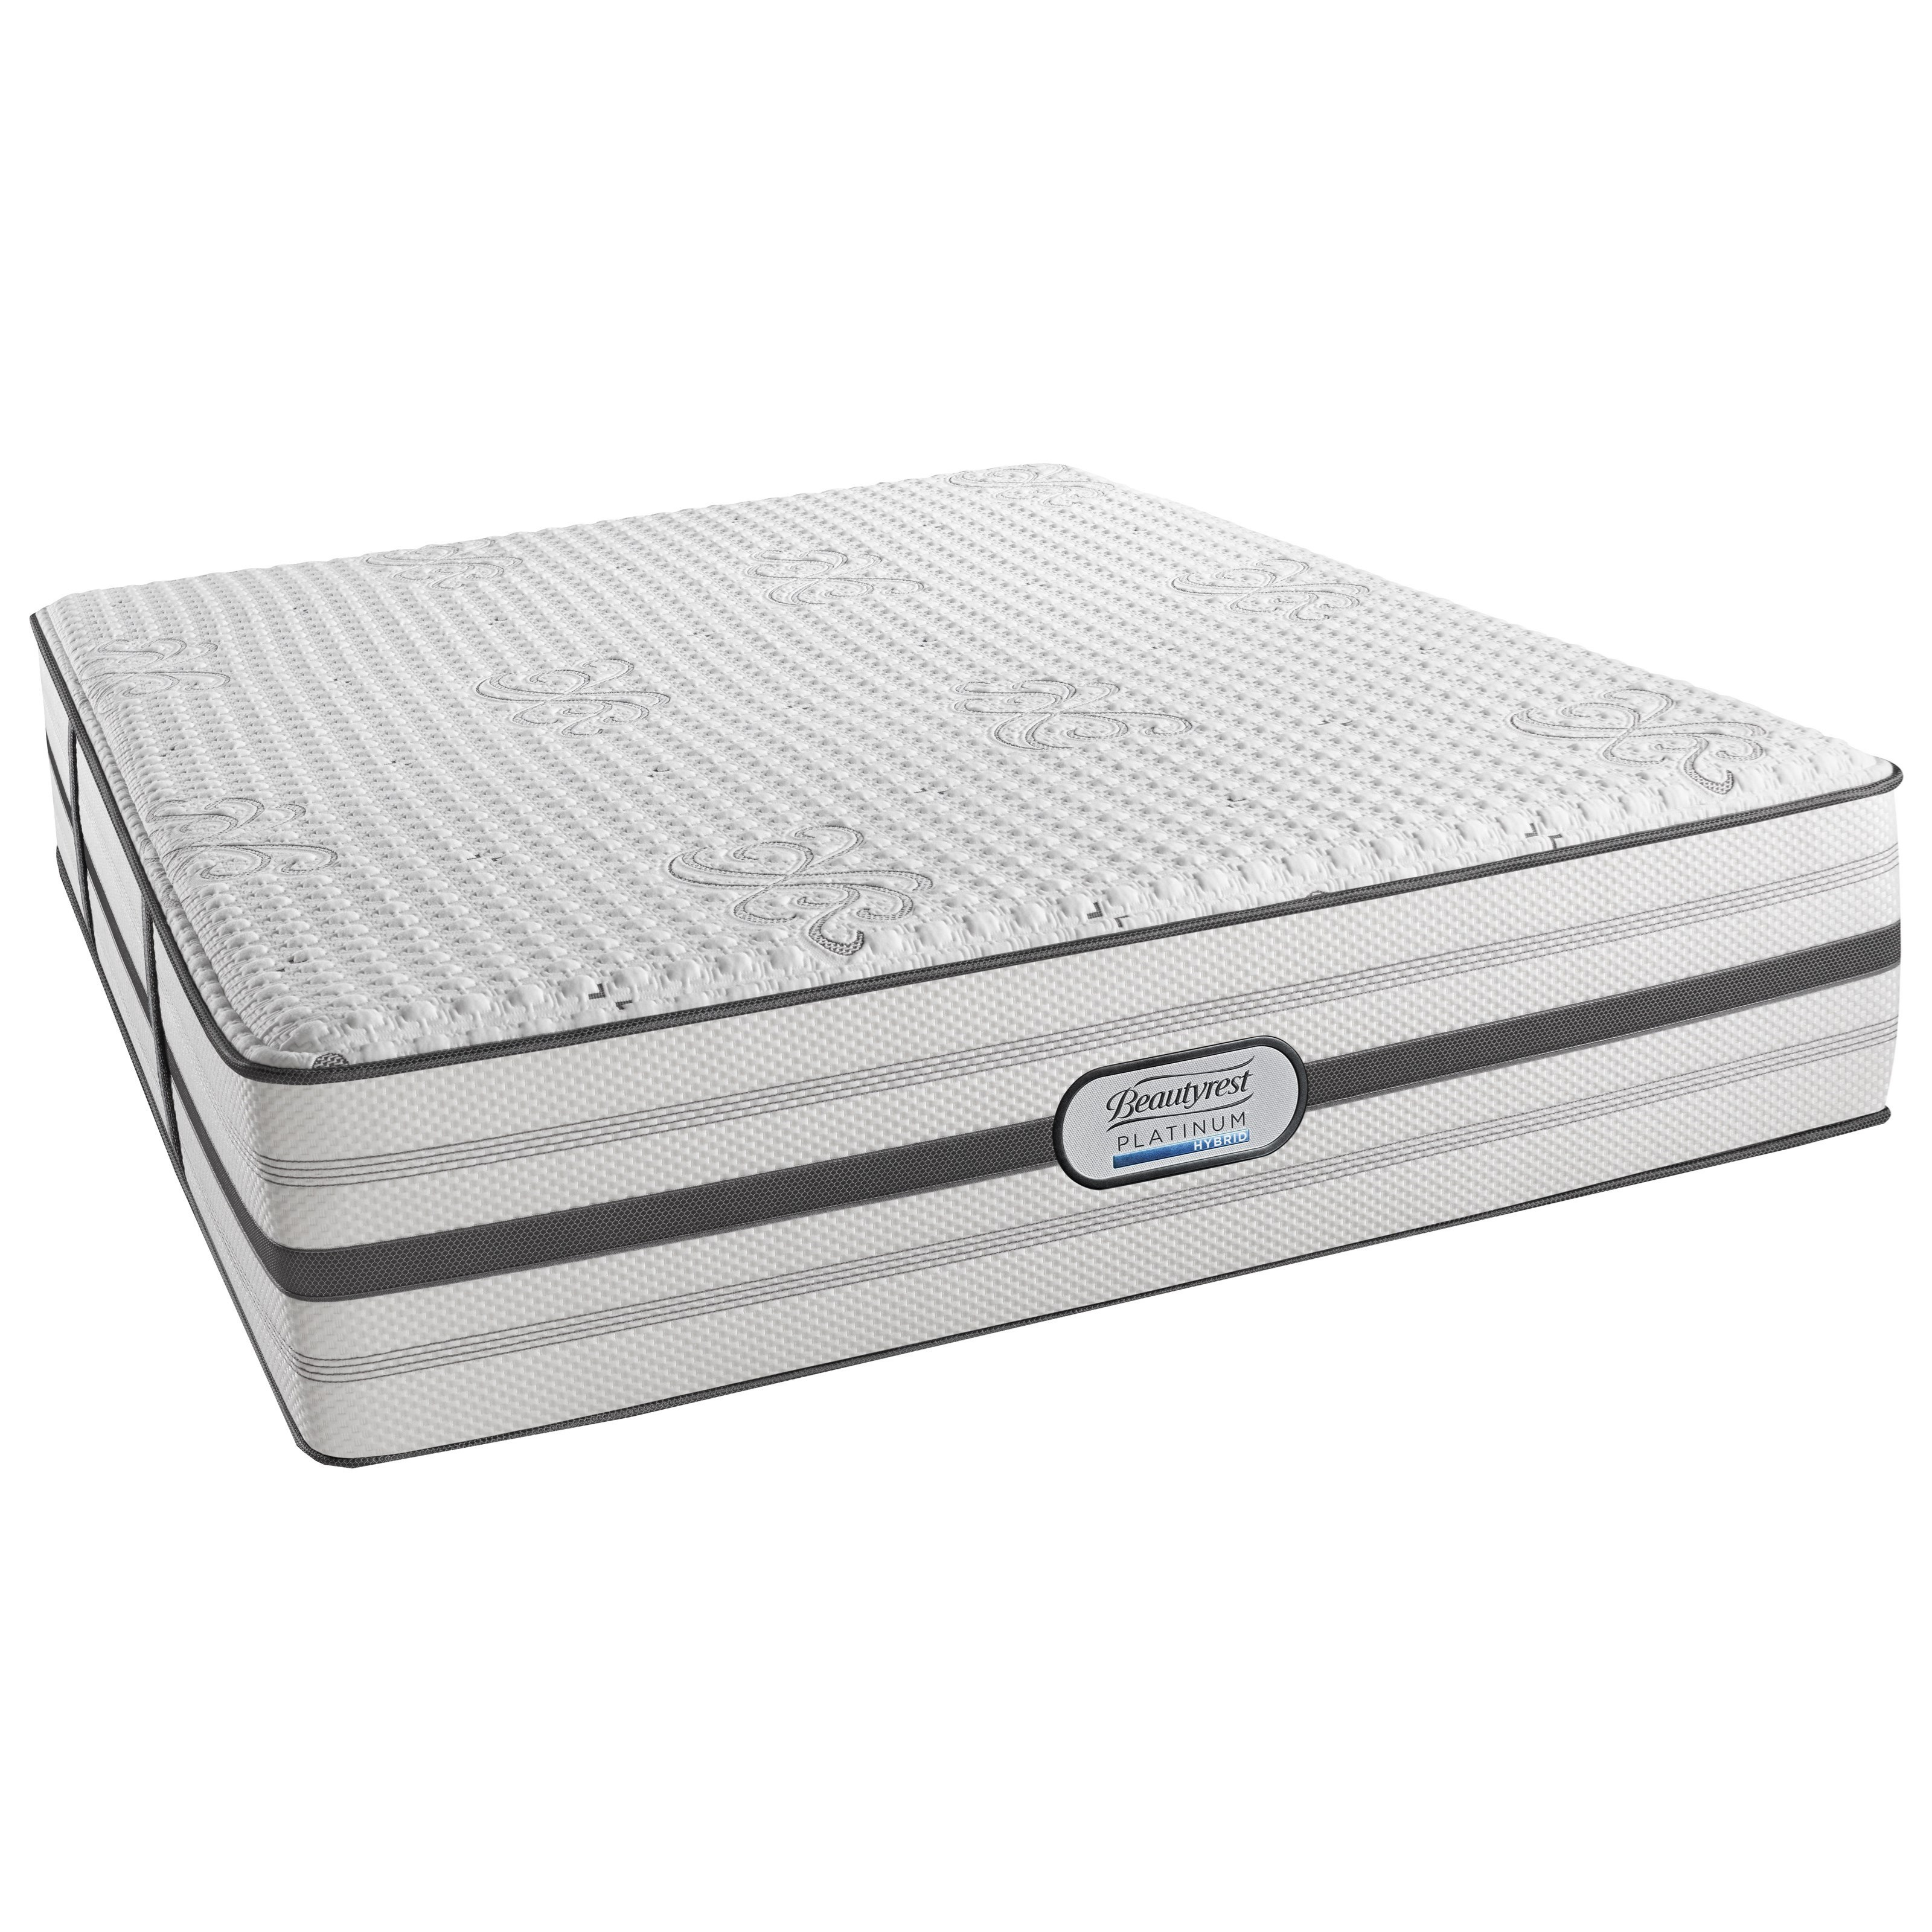 Beautyrest Platinum Austin Twin XL Luxury Firm Adjustable Set - Item Number: BRHLV1LF-TXL+SM1-TXL